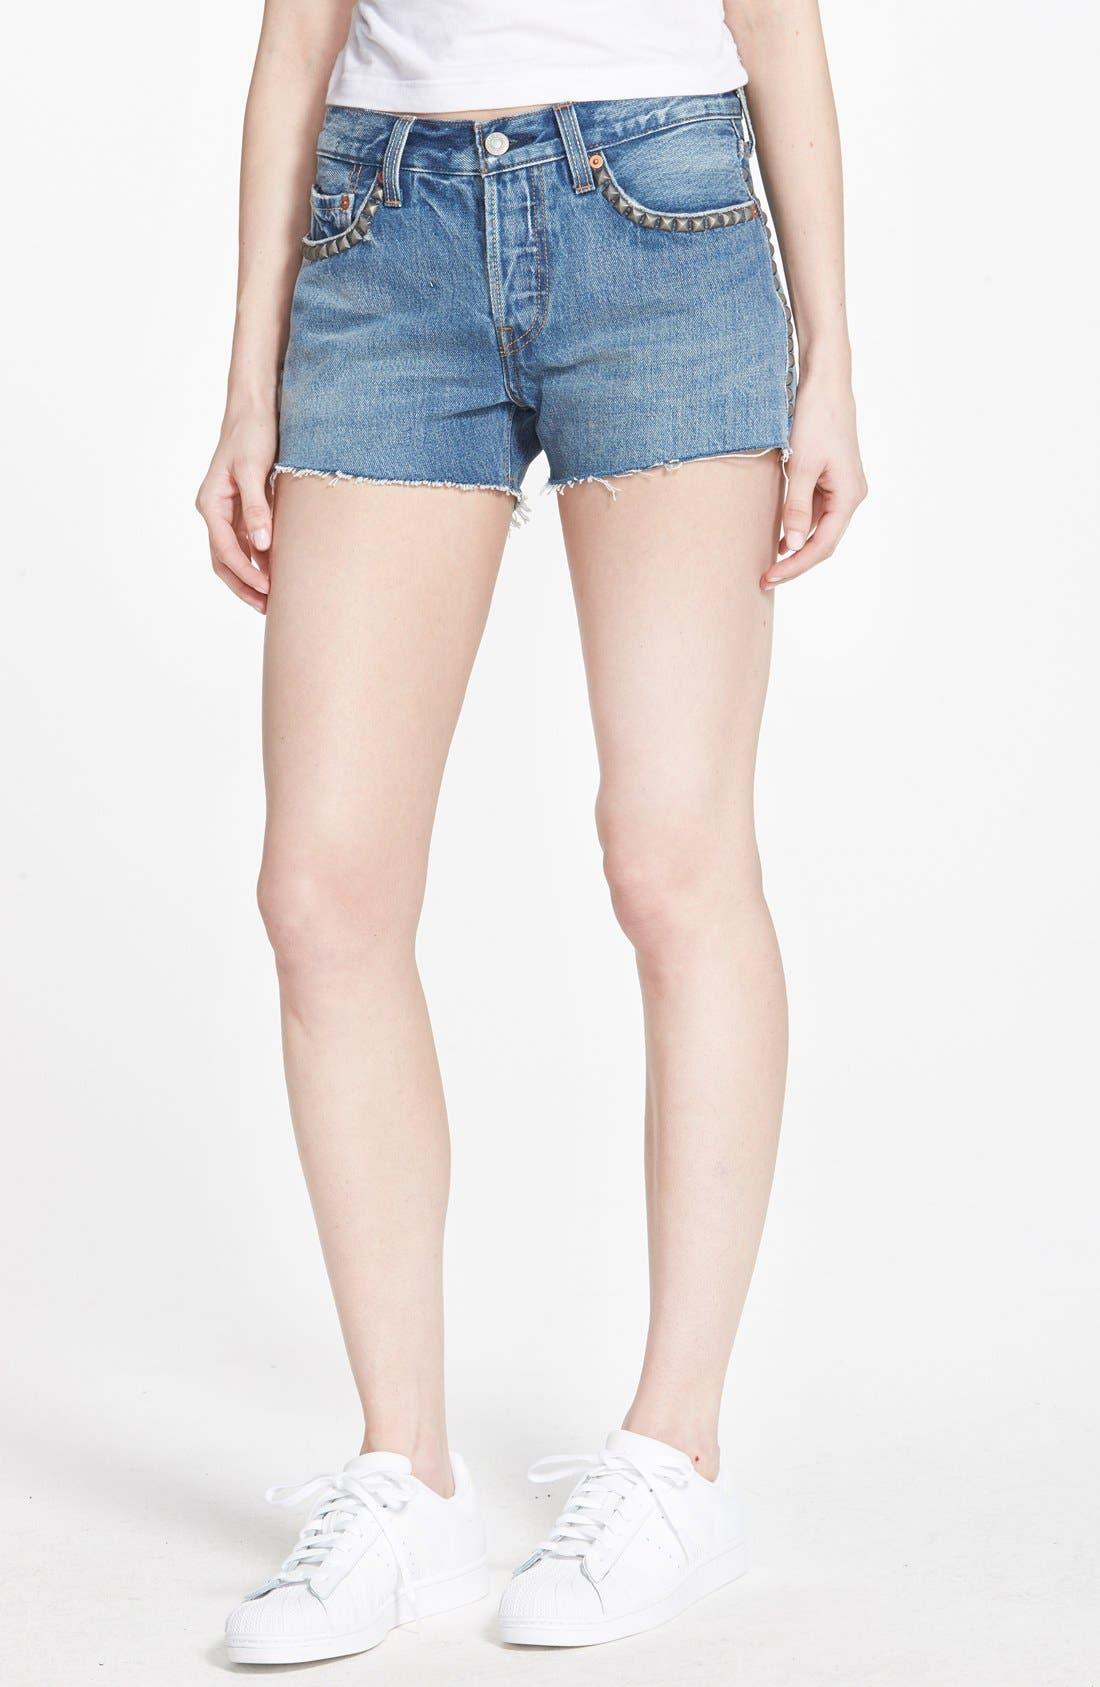 Alternate Image 1 Selected - Levi's® '501®' Cutoff Denim Shorts (Brightest Blue)